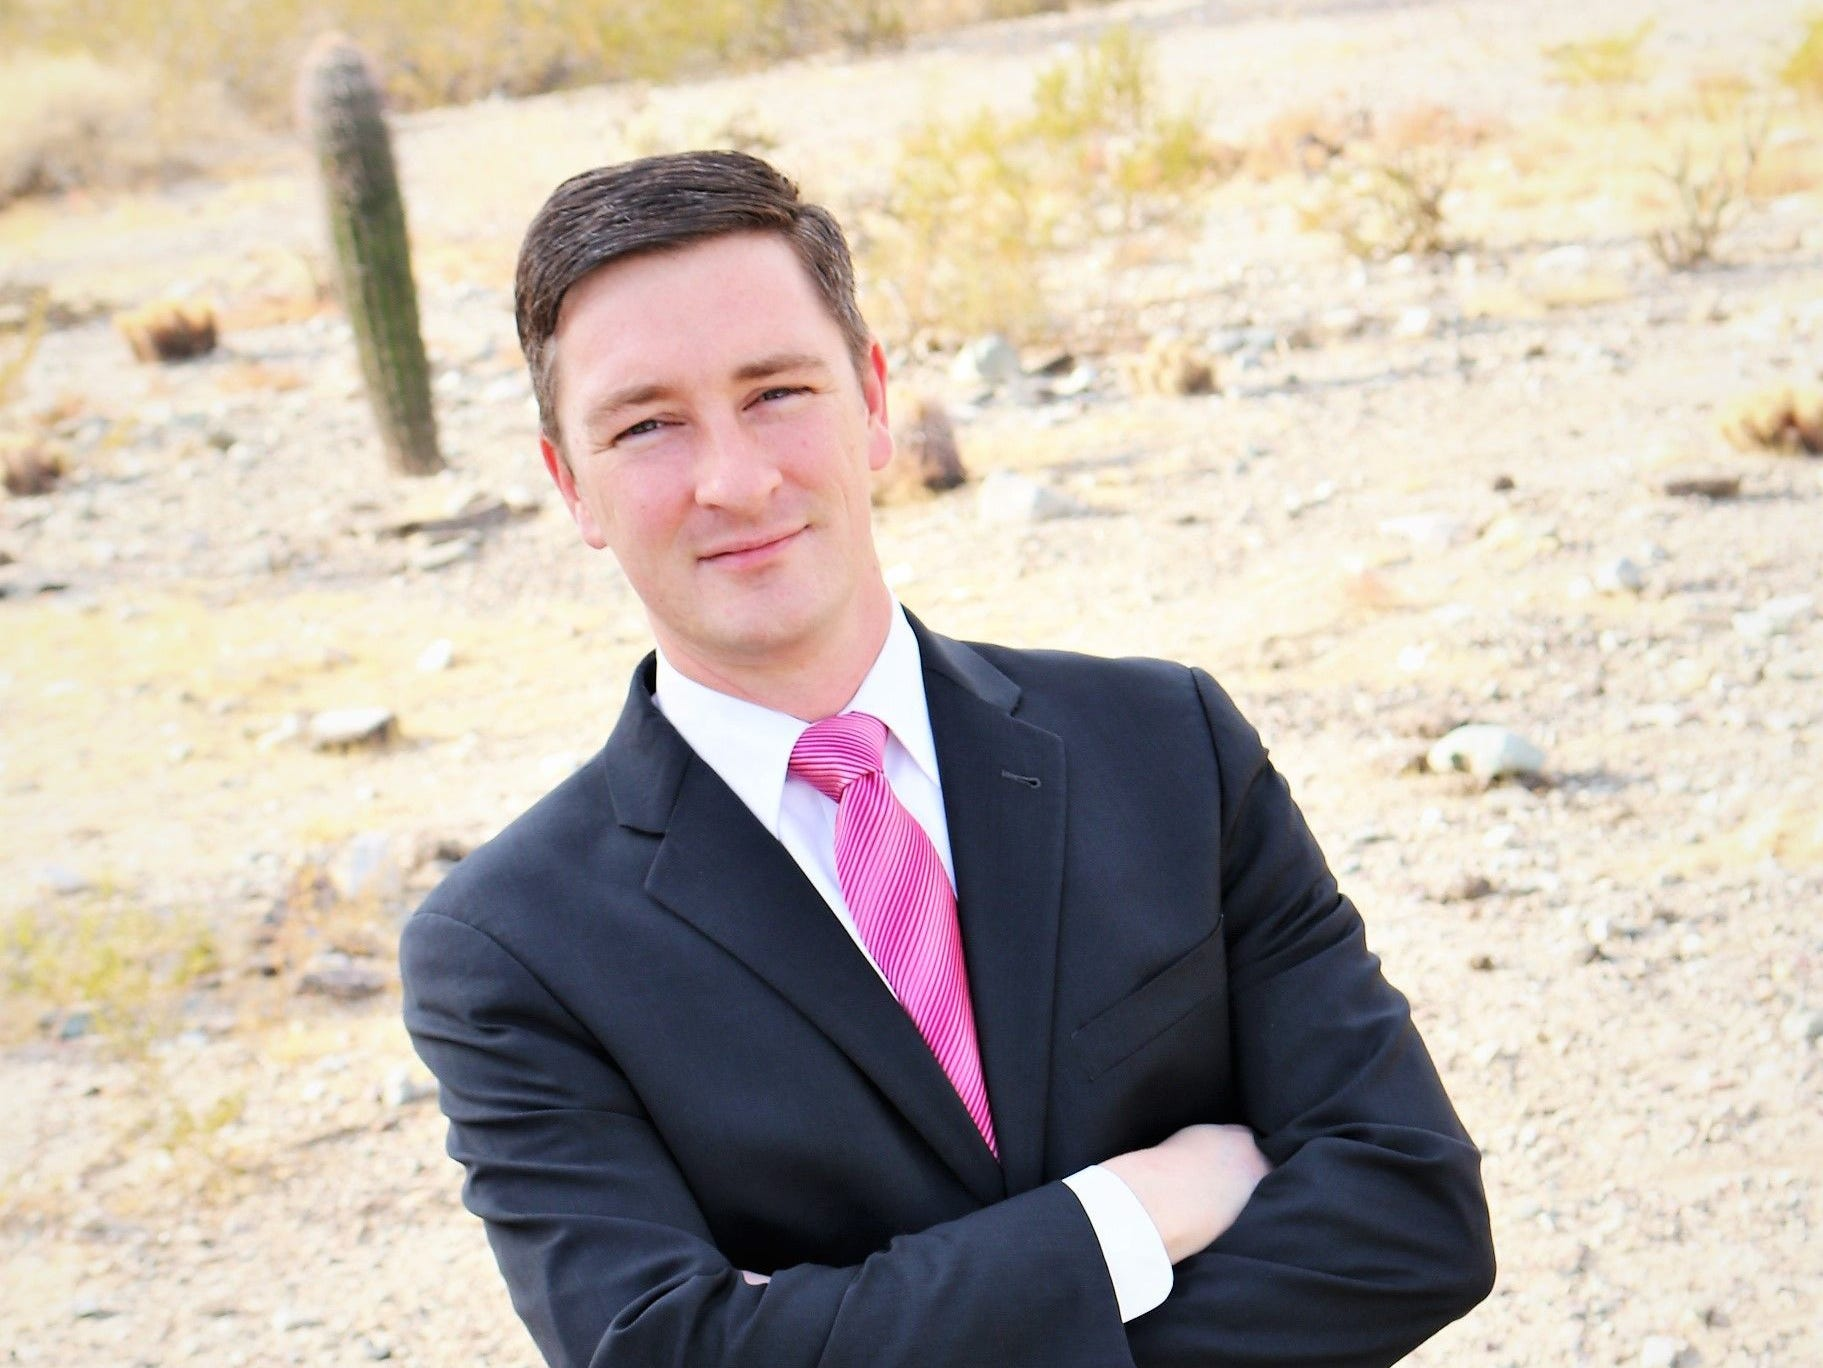 Nicholas Sarwark Nicholas Sarwark, Chairman of the National Libertarian Party, is running for Phoenix mayor.